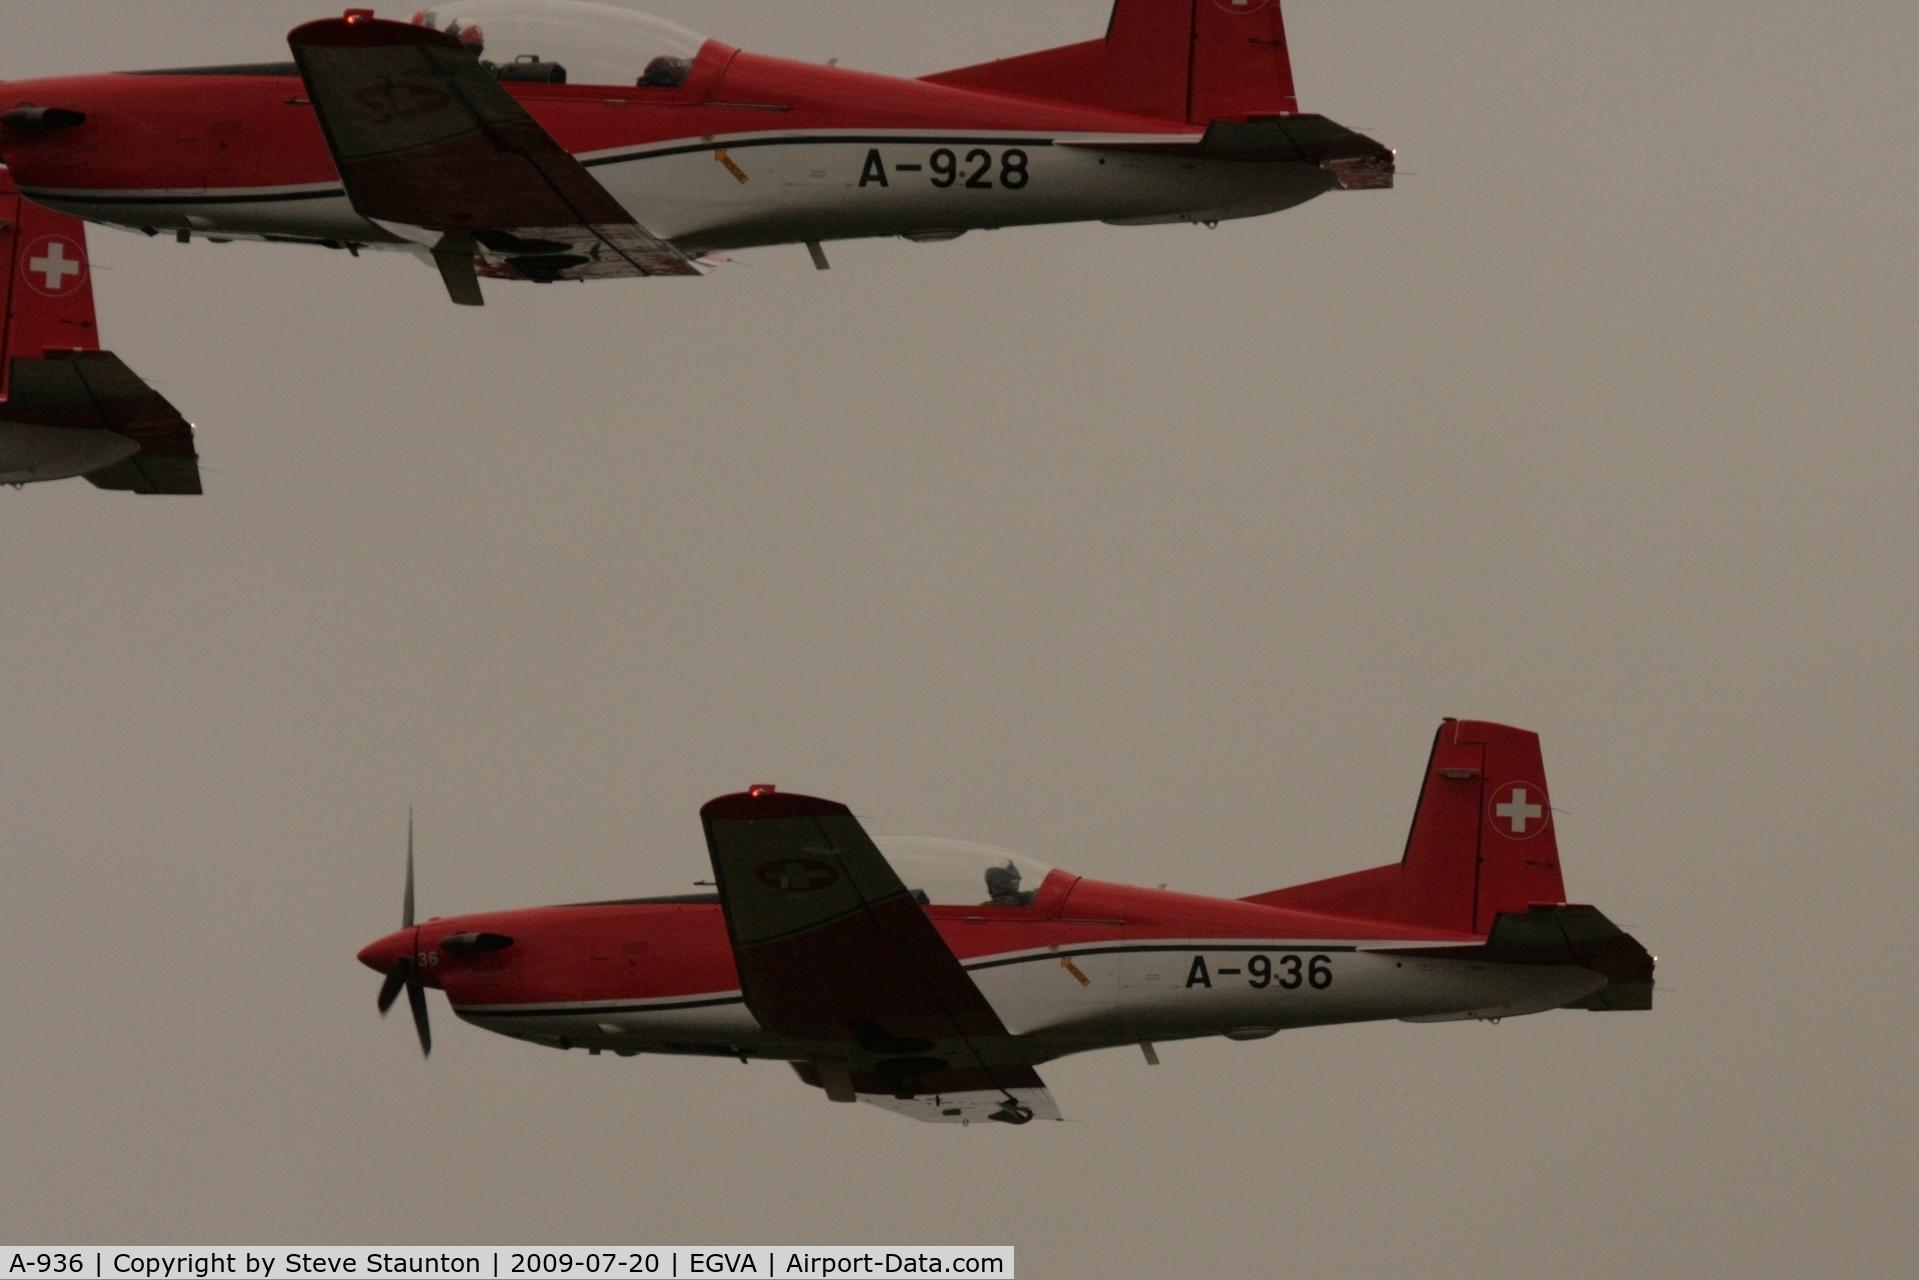 A-936, 1983 Pilatus PC-7 Turbo Trainer C/N 344, Taken at the Royal International Air Tattoo 2009